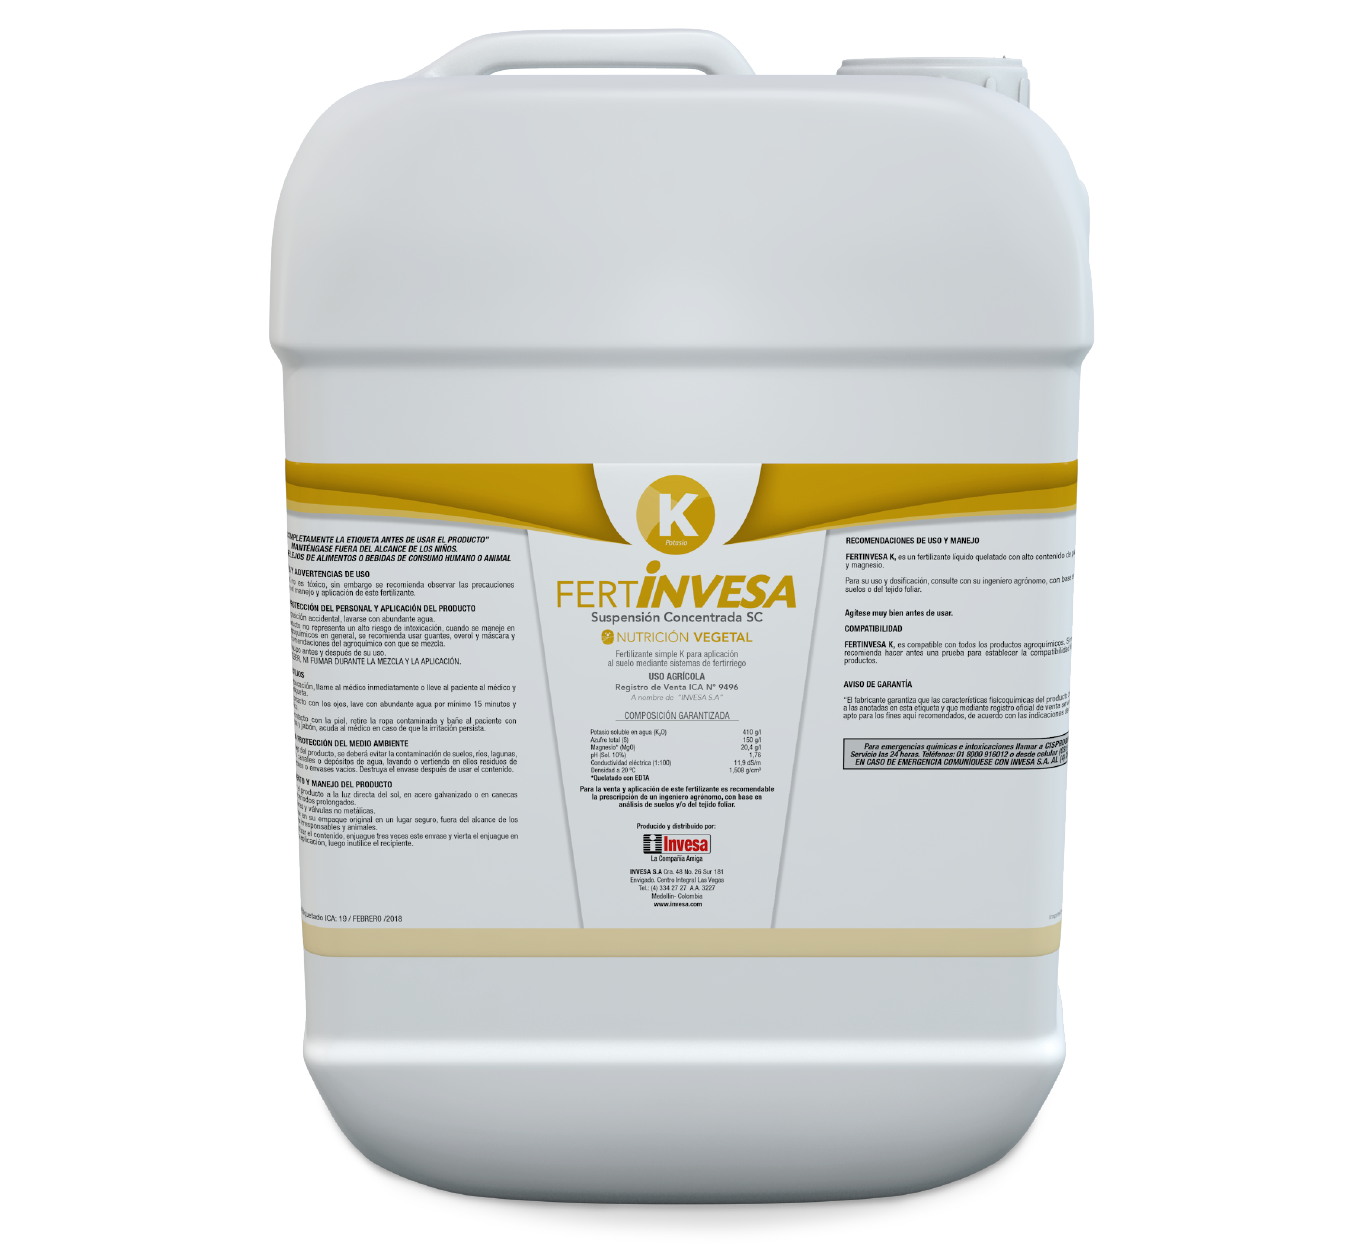 Fertilizante fertinvesa k invesa 20 litros